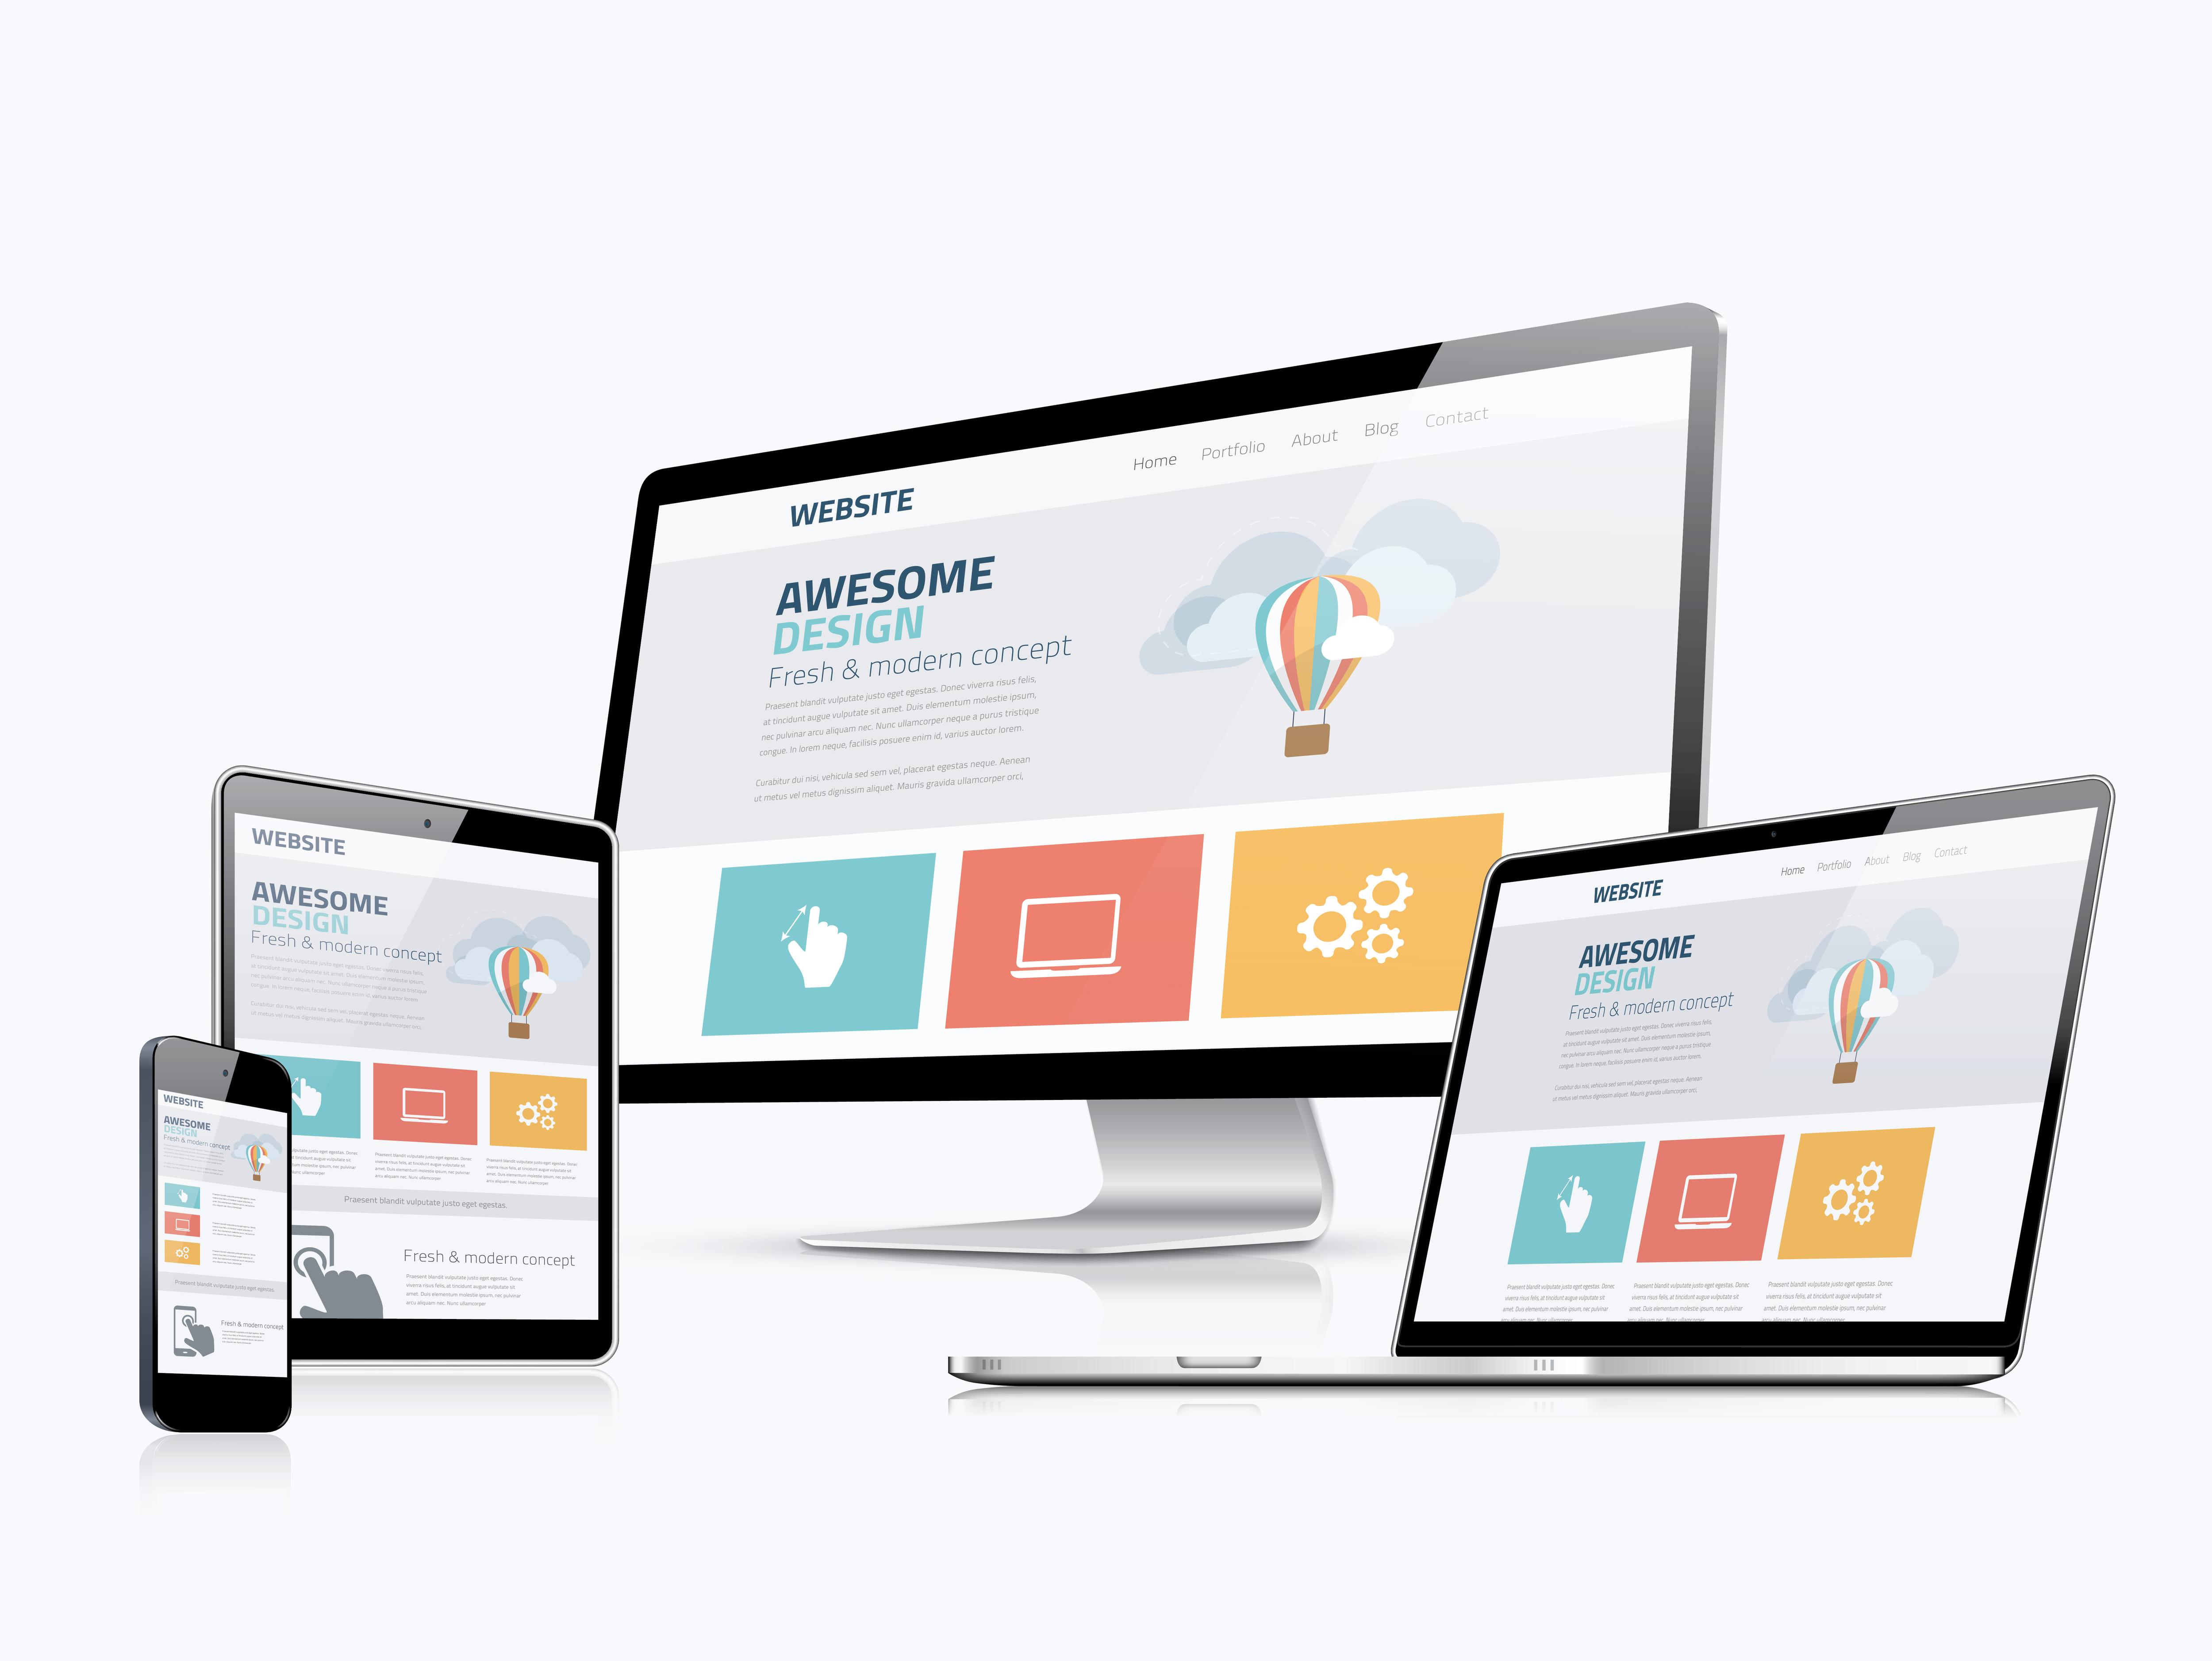 Webサイトリニューアルにおけるデジタルマーケティング